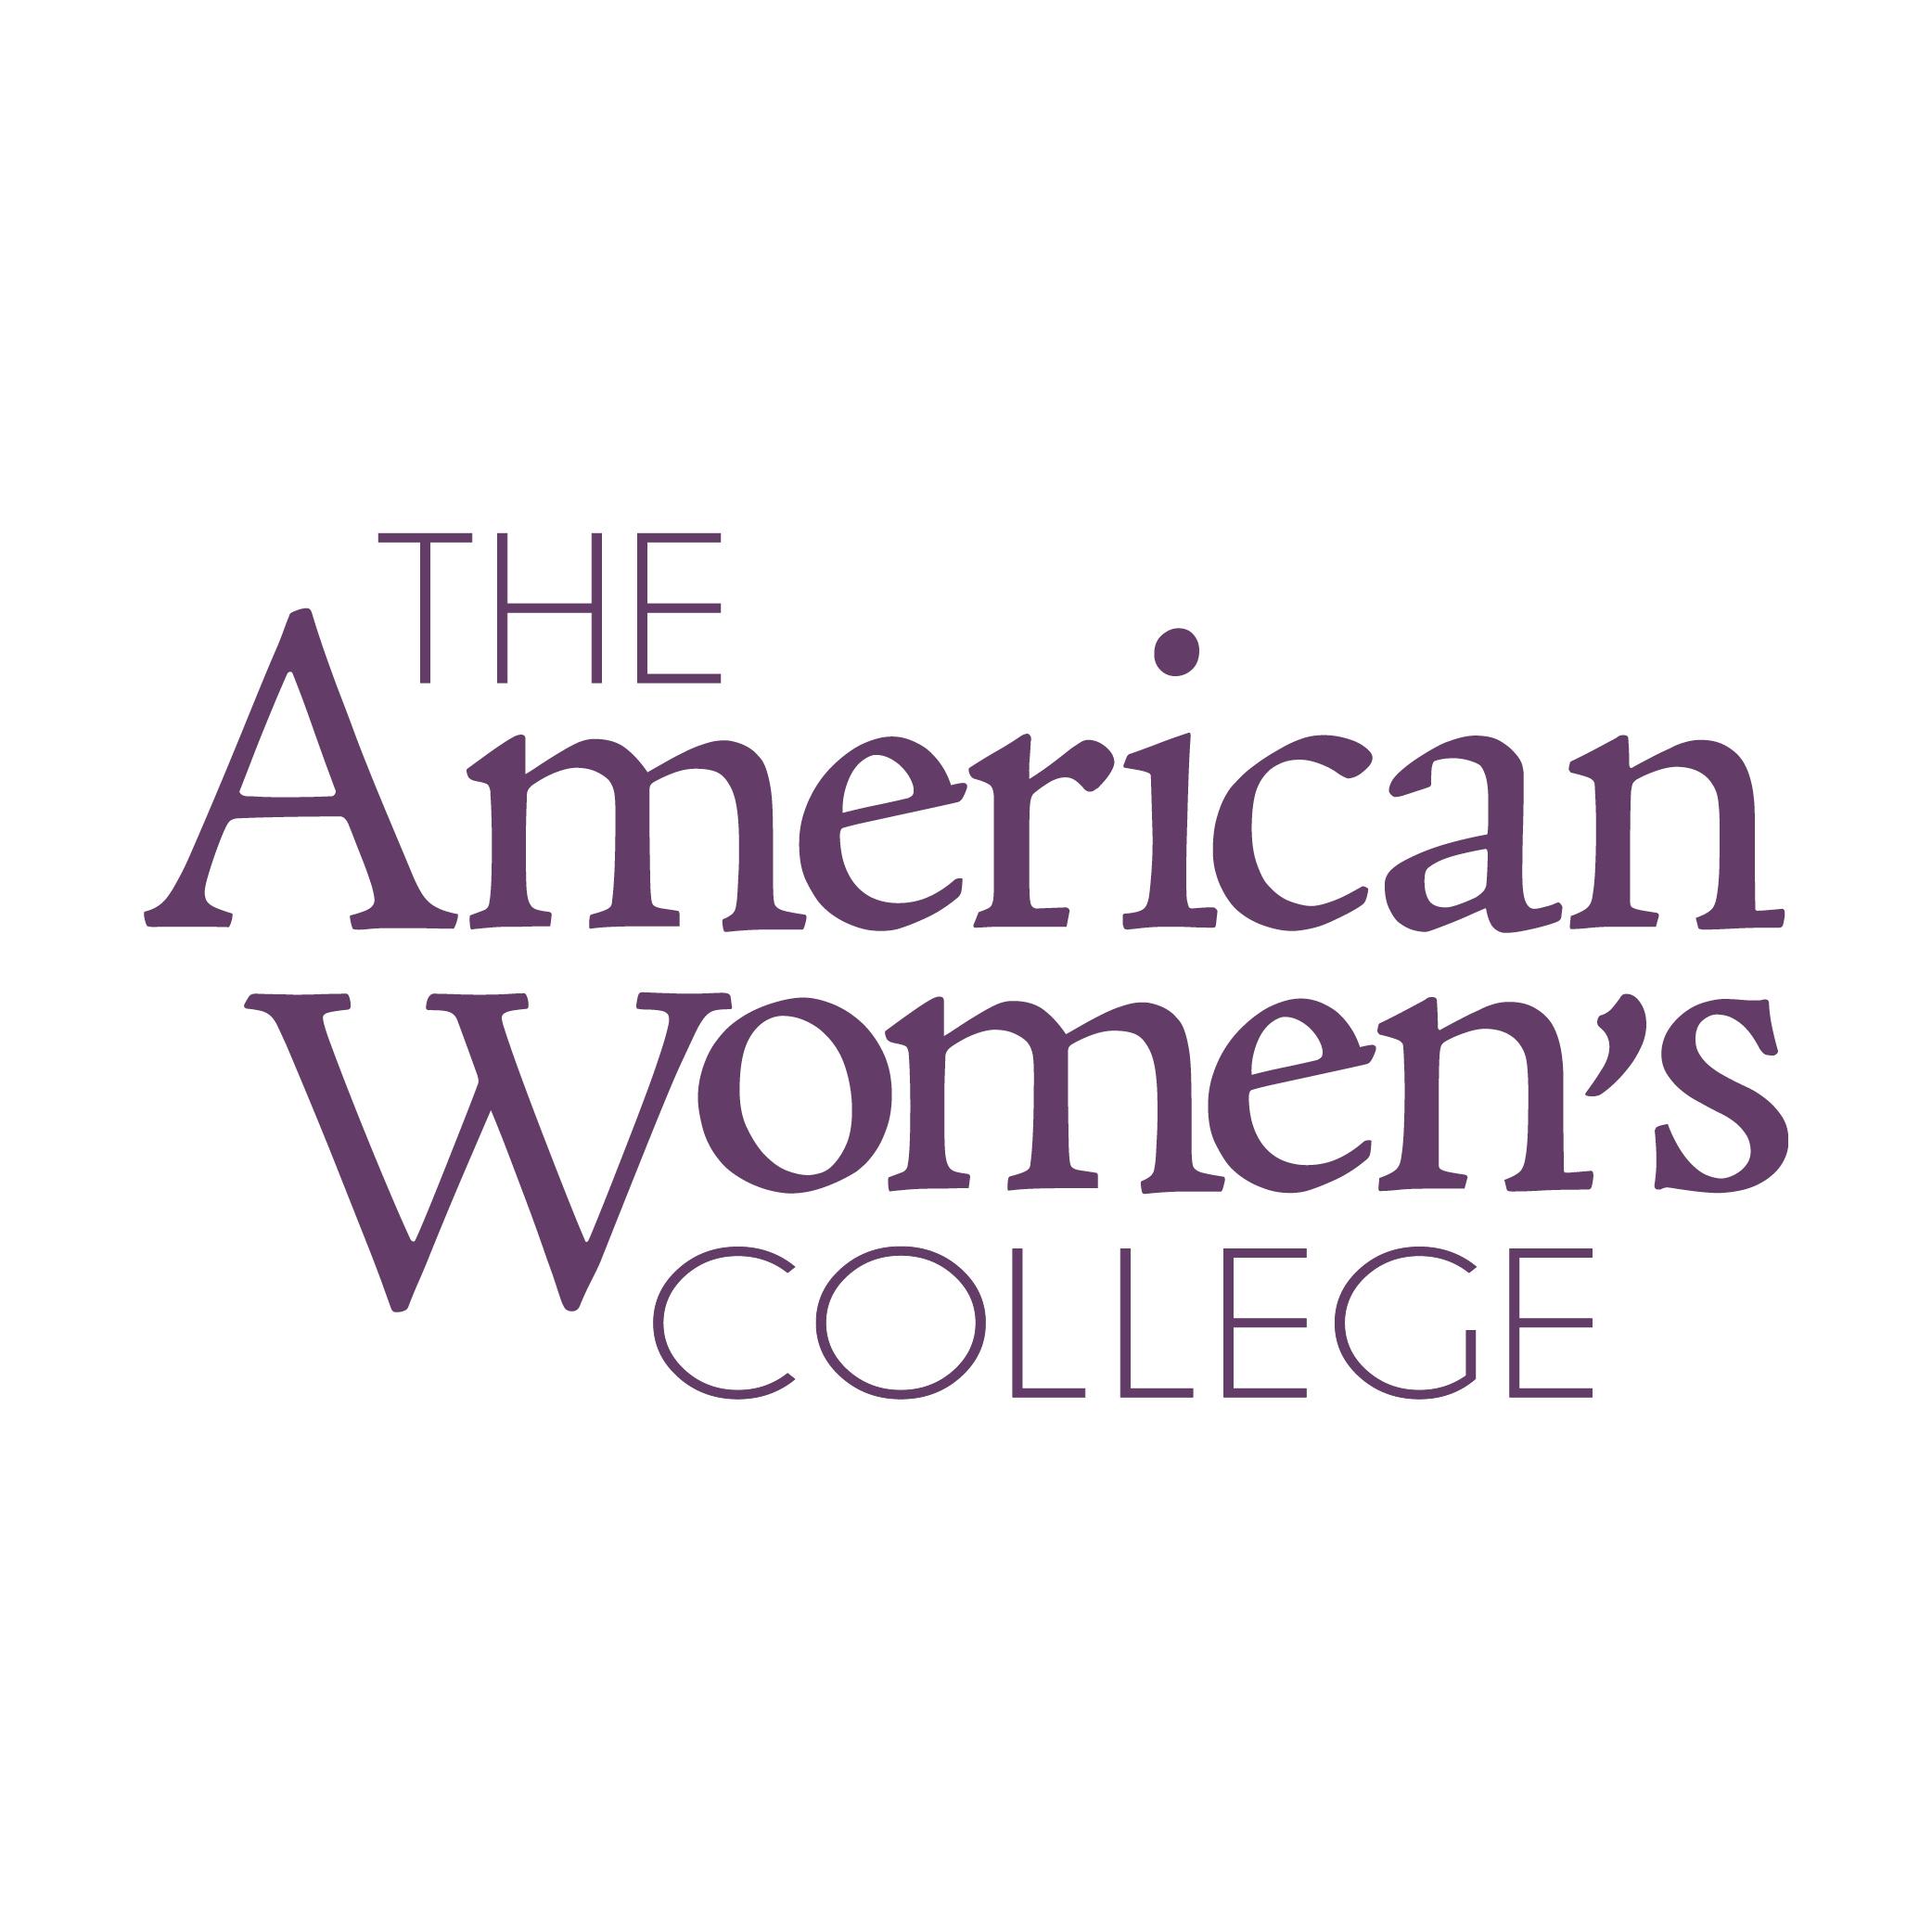 The American Women's College